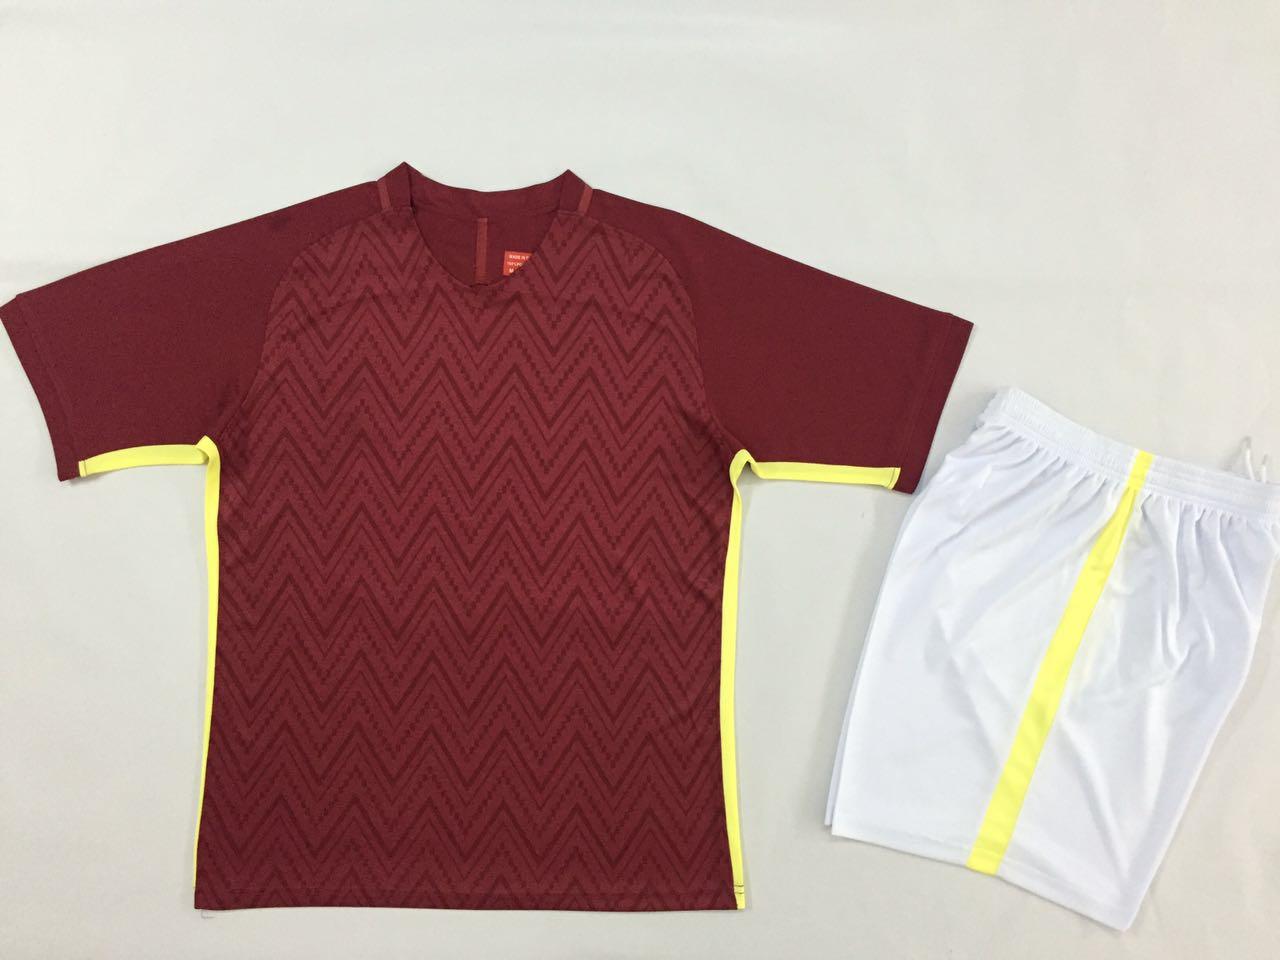 16/17 America Red jerseys